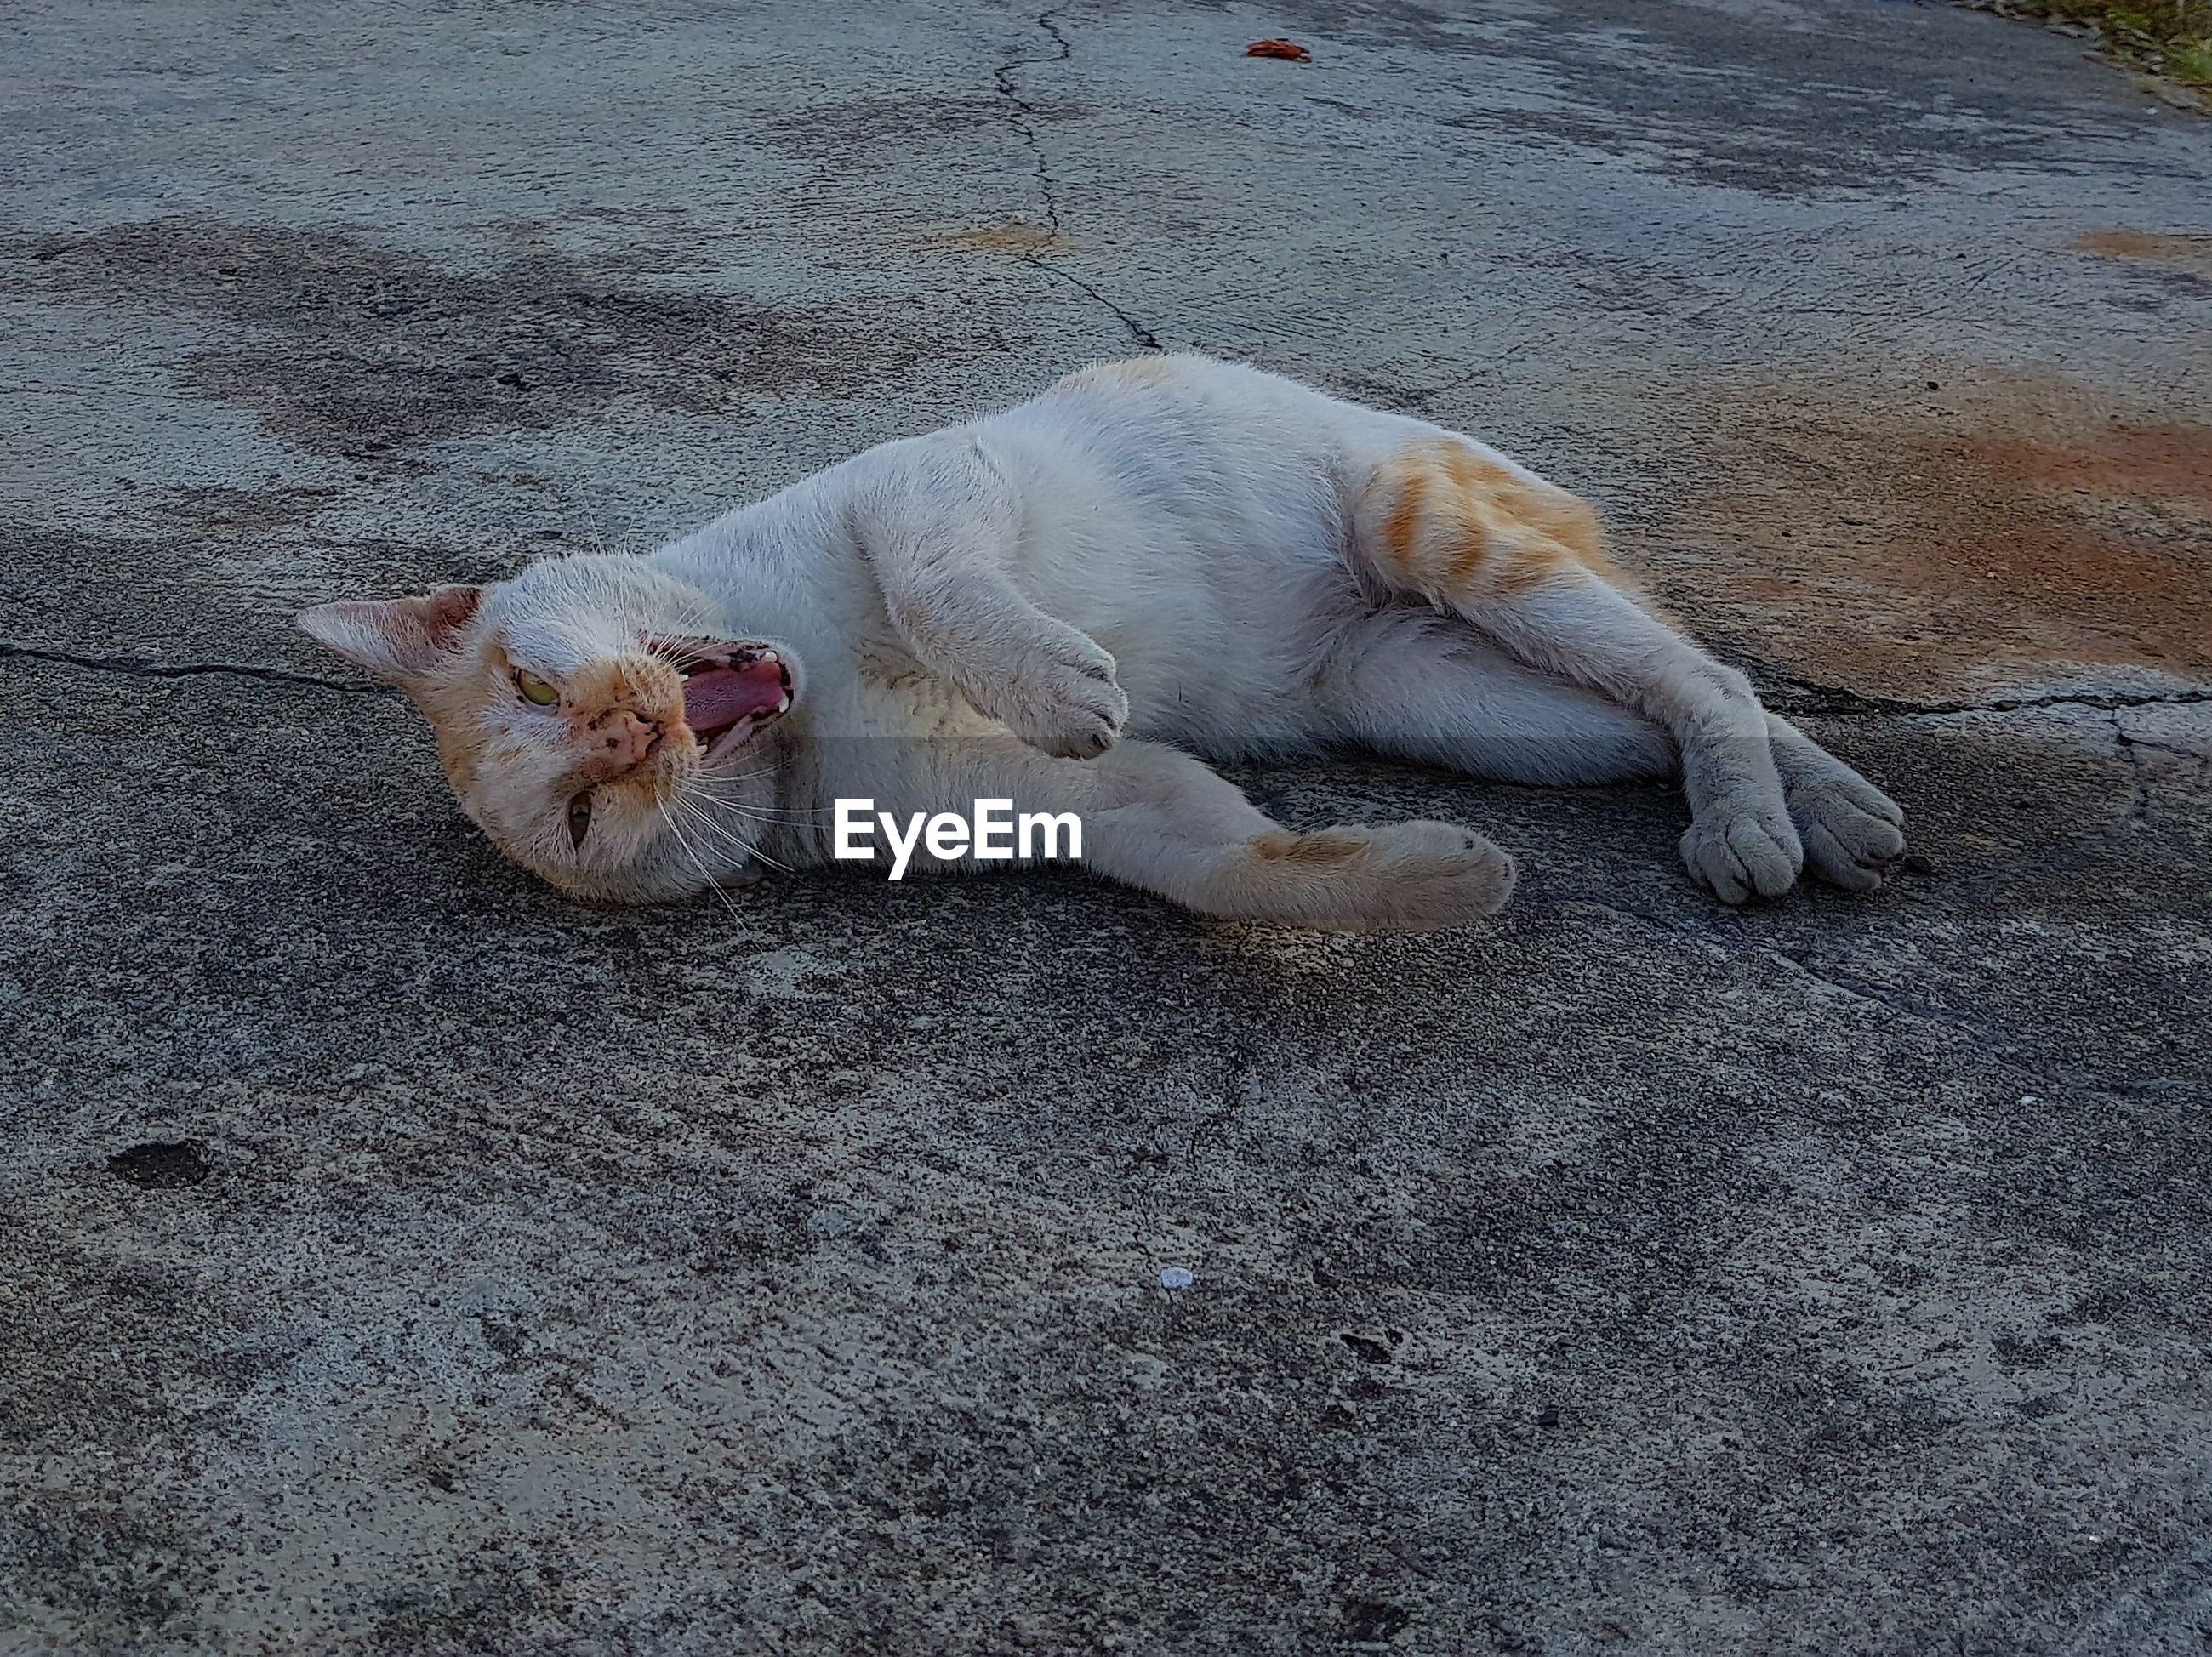 CAT SLEEPING ON GROUND